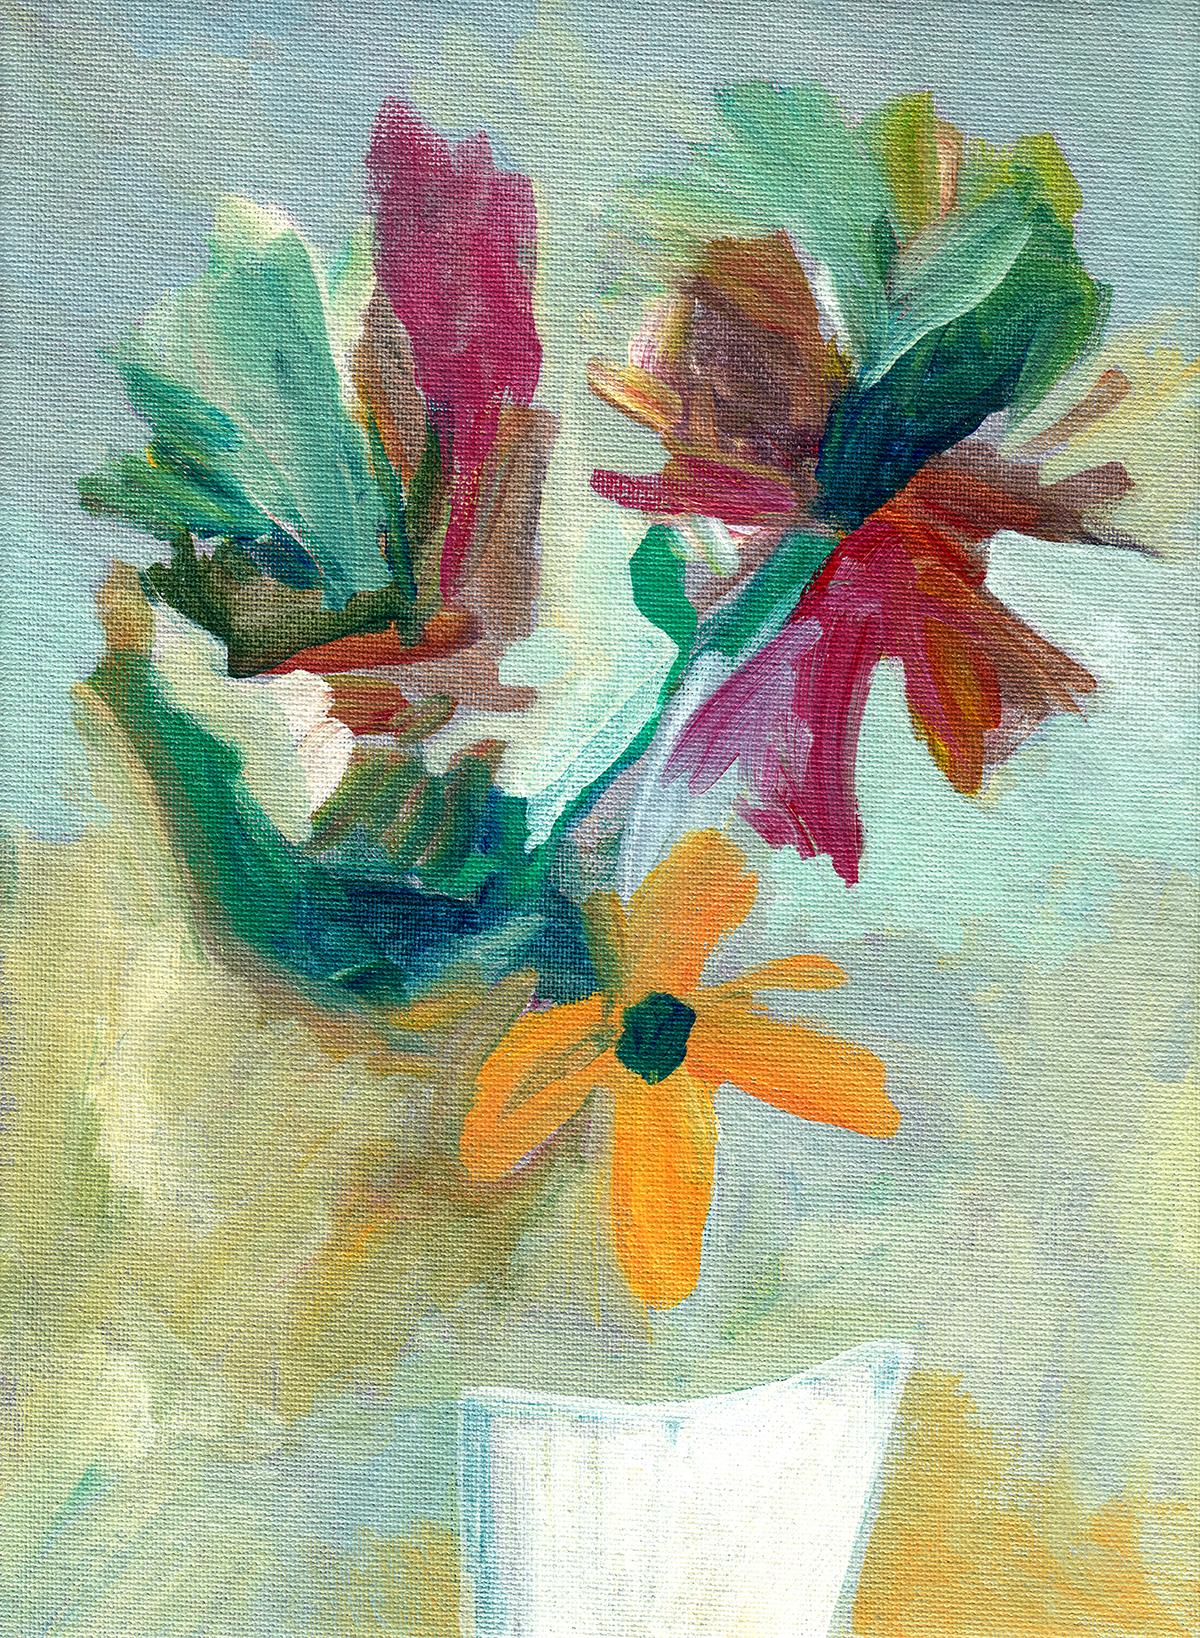 bali-painting-03-edited-1200.jpg